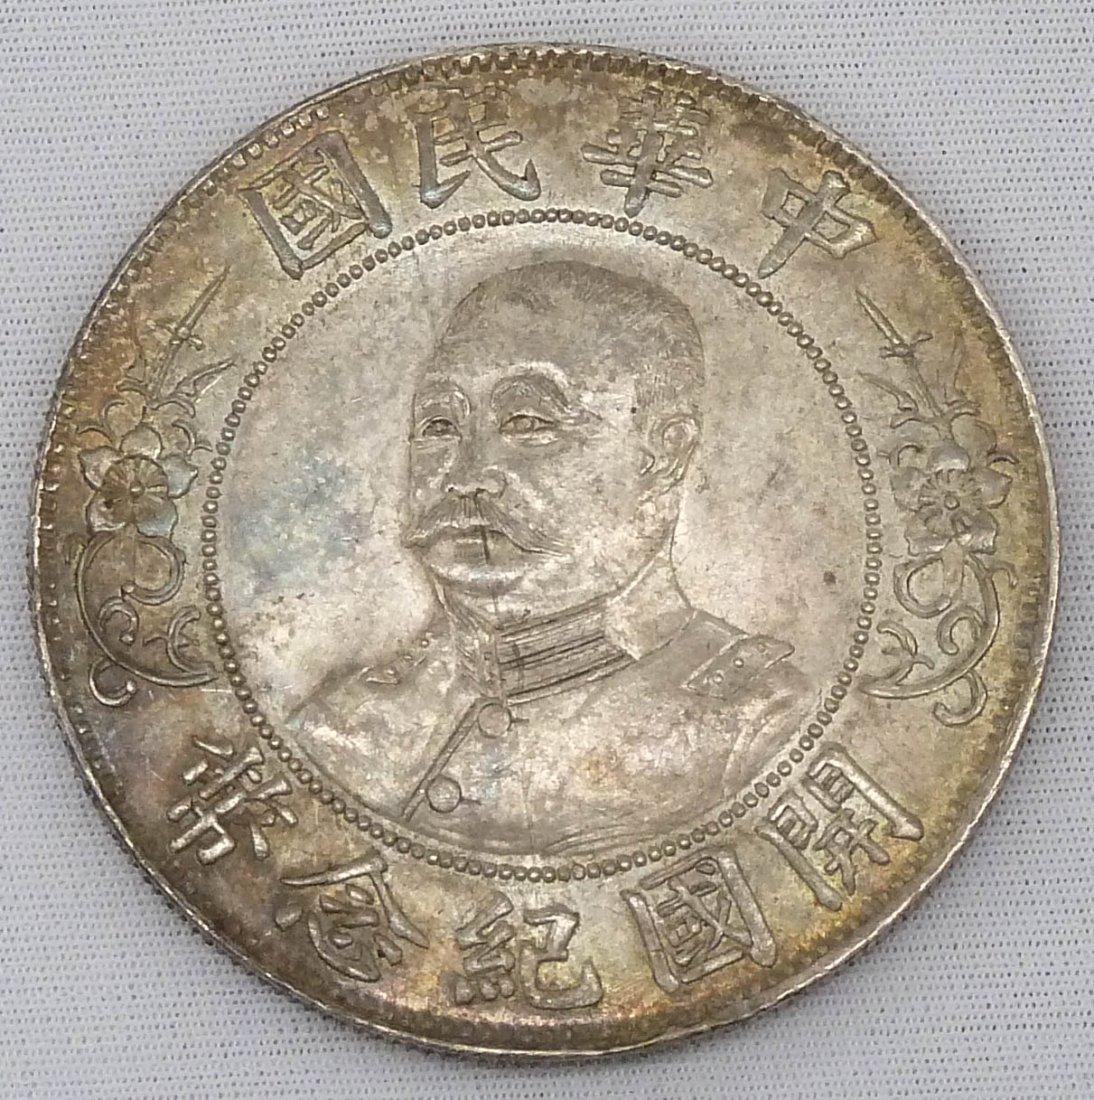 1912 Chinese Li Yuan-Hung Republic Silver Dollar (B).